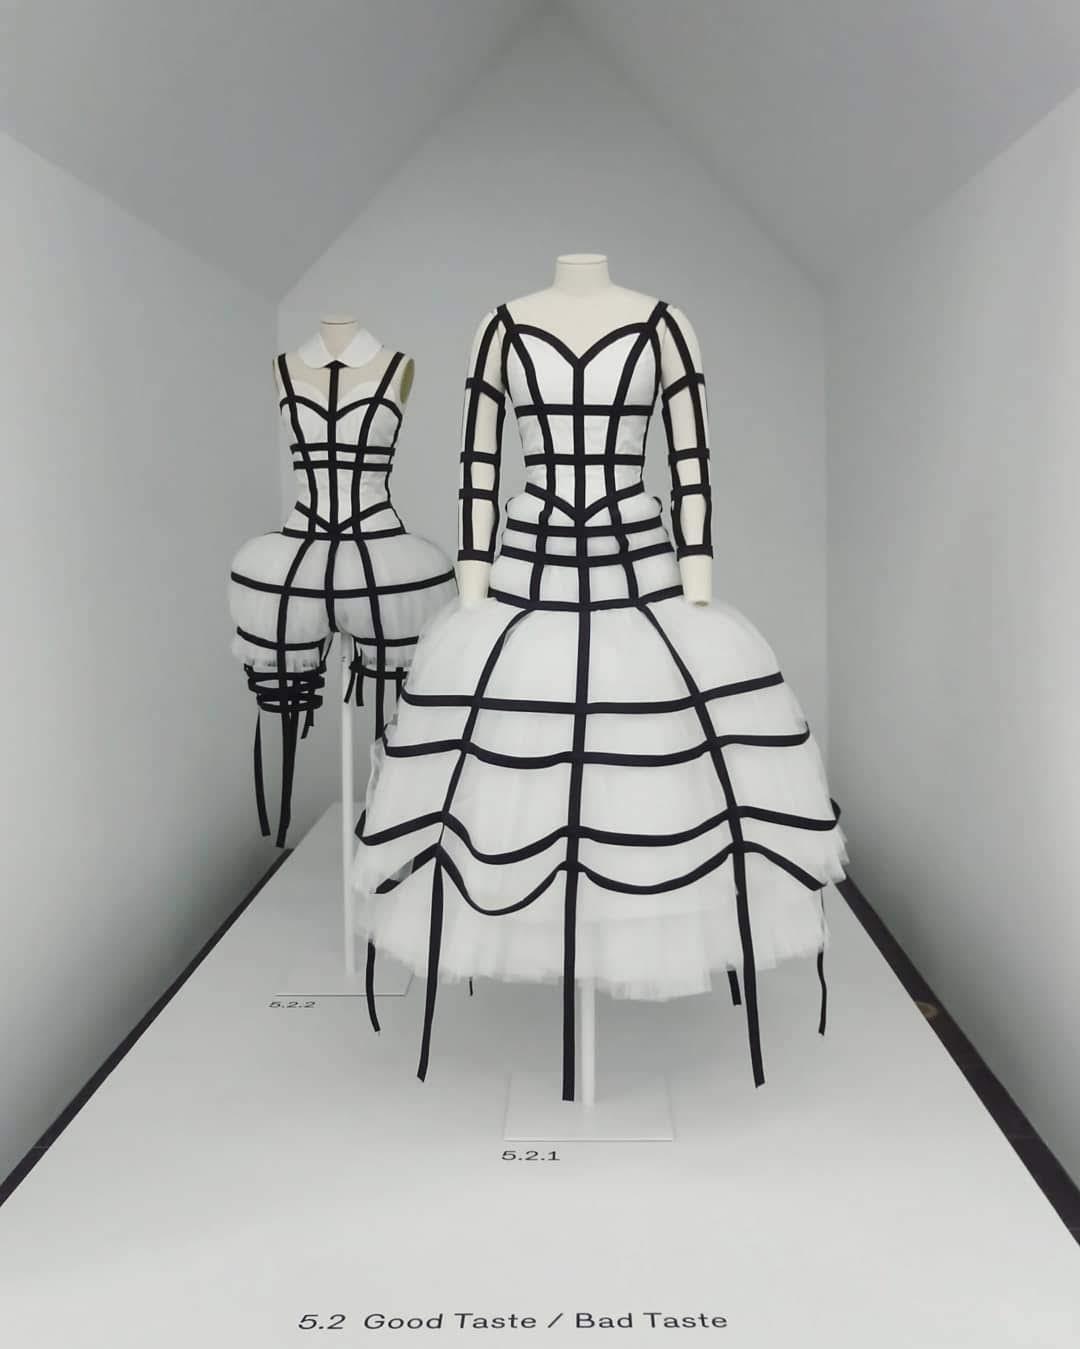 Bubblegum Dreaming Cage Dress Inspiration: Comme des Garçons AW 2008-9